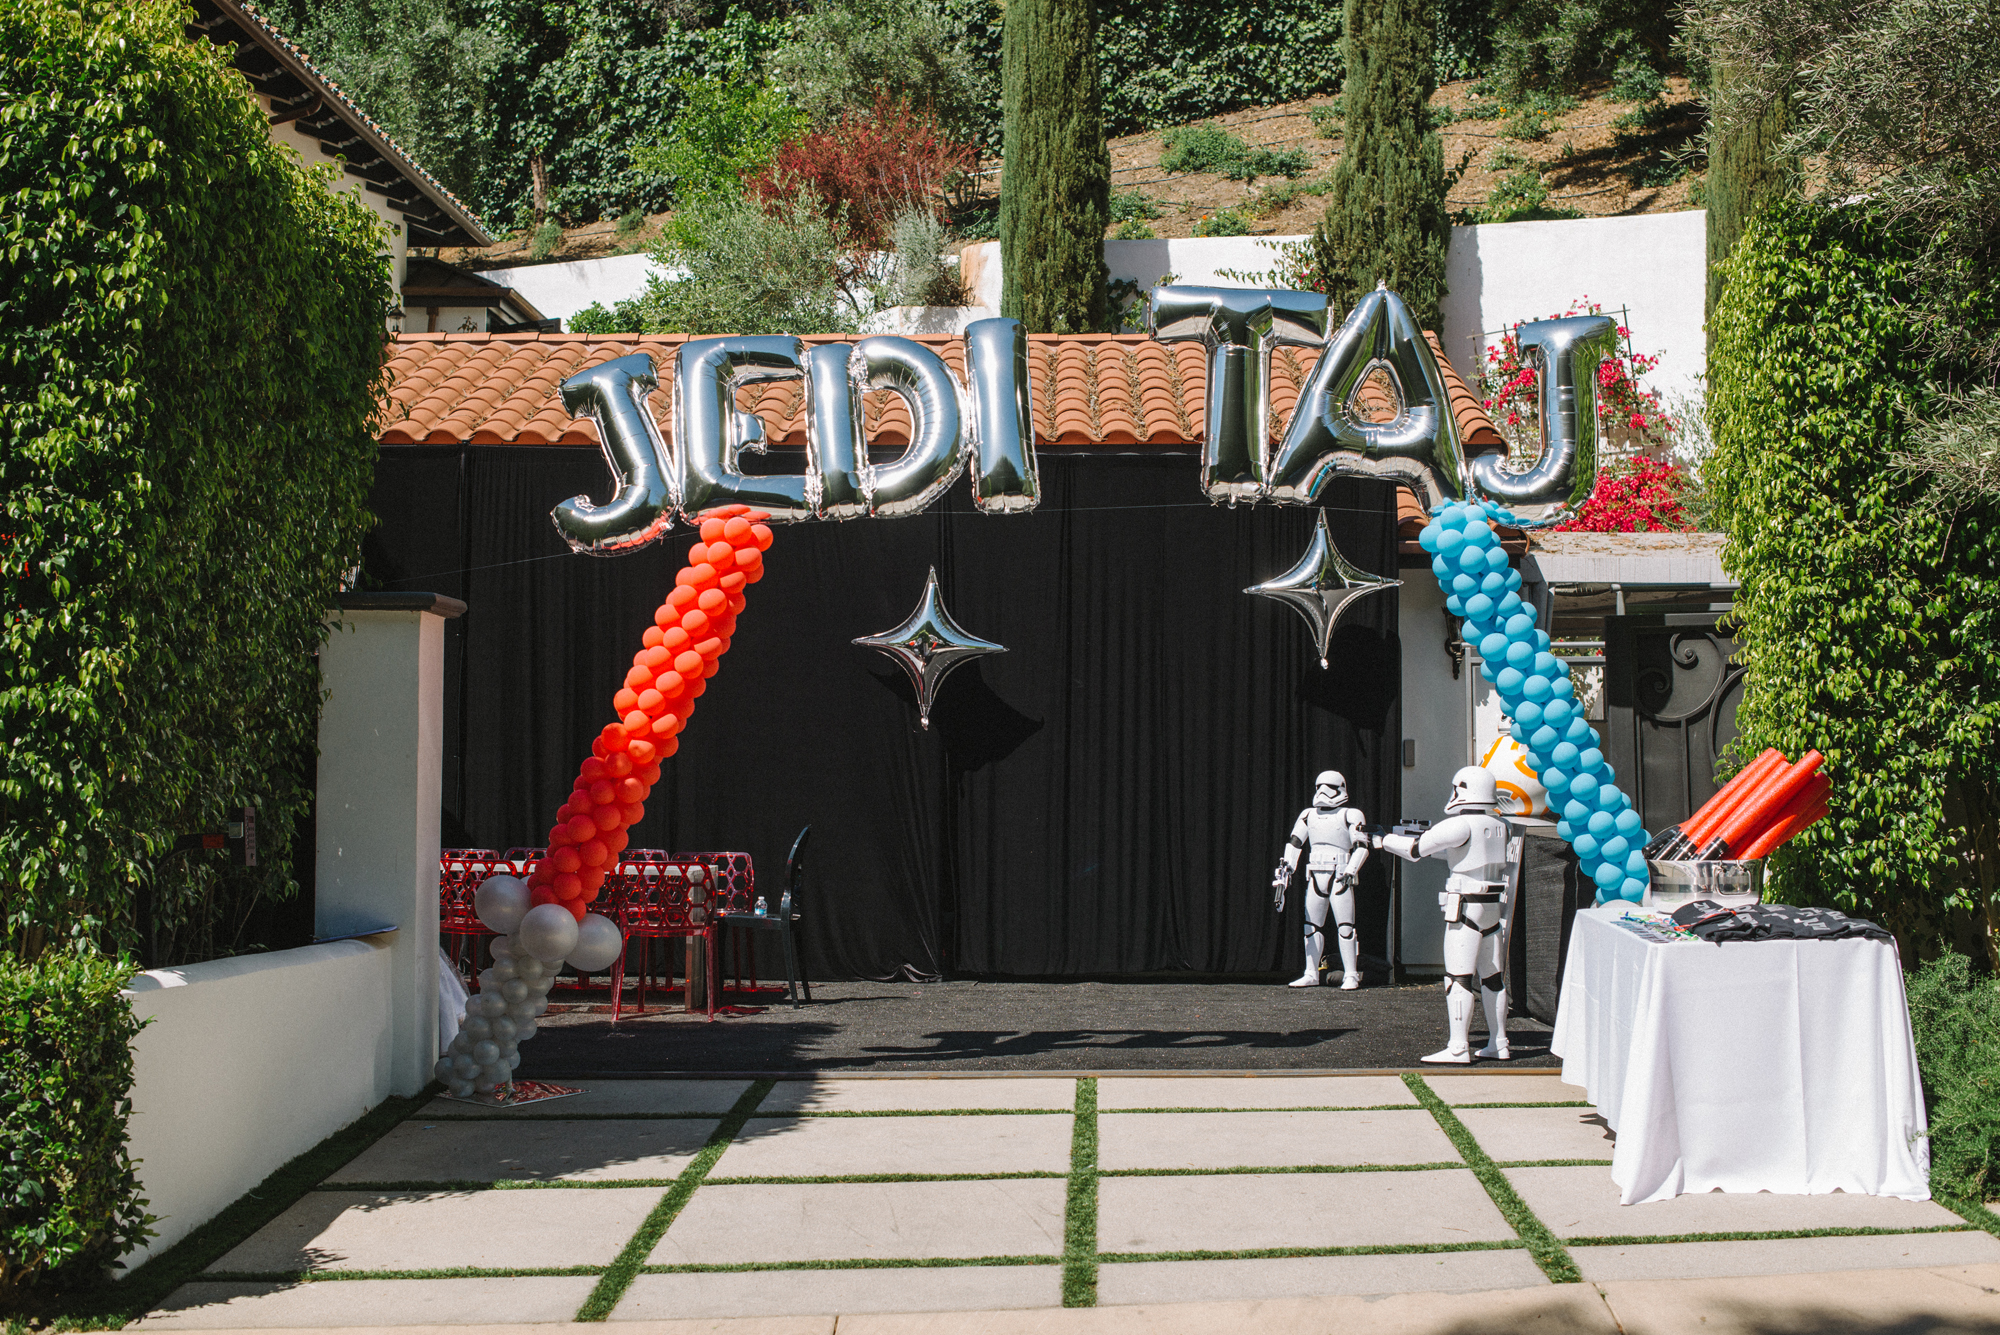 tarynco-events-starwars-themed-kids-birthday-party-balloons-jedi-decor-design.jpg